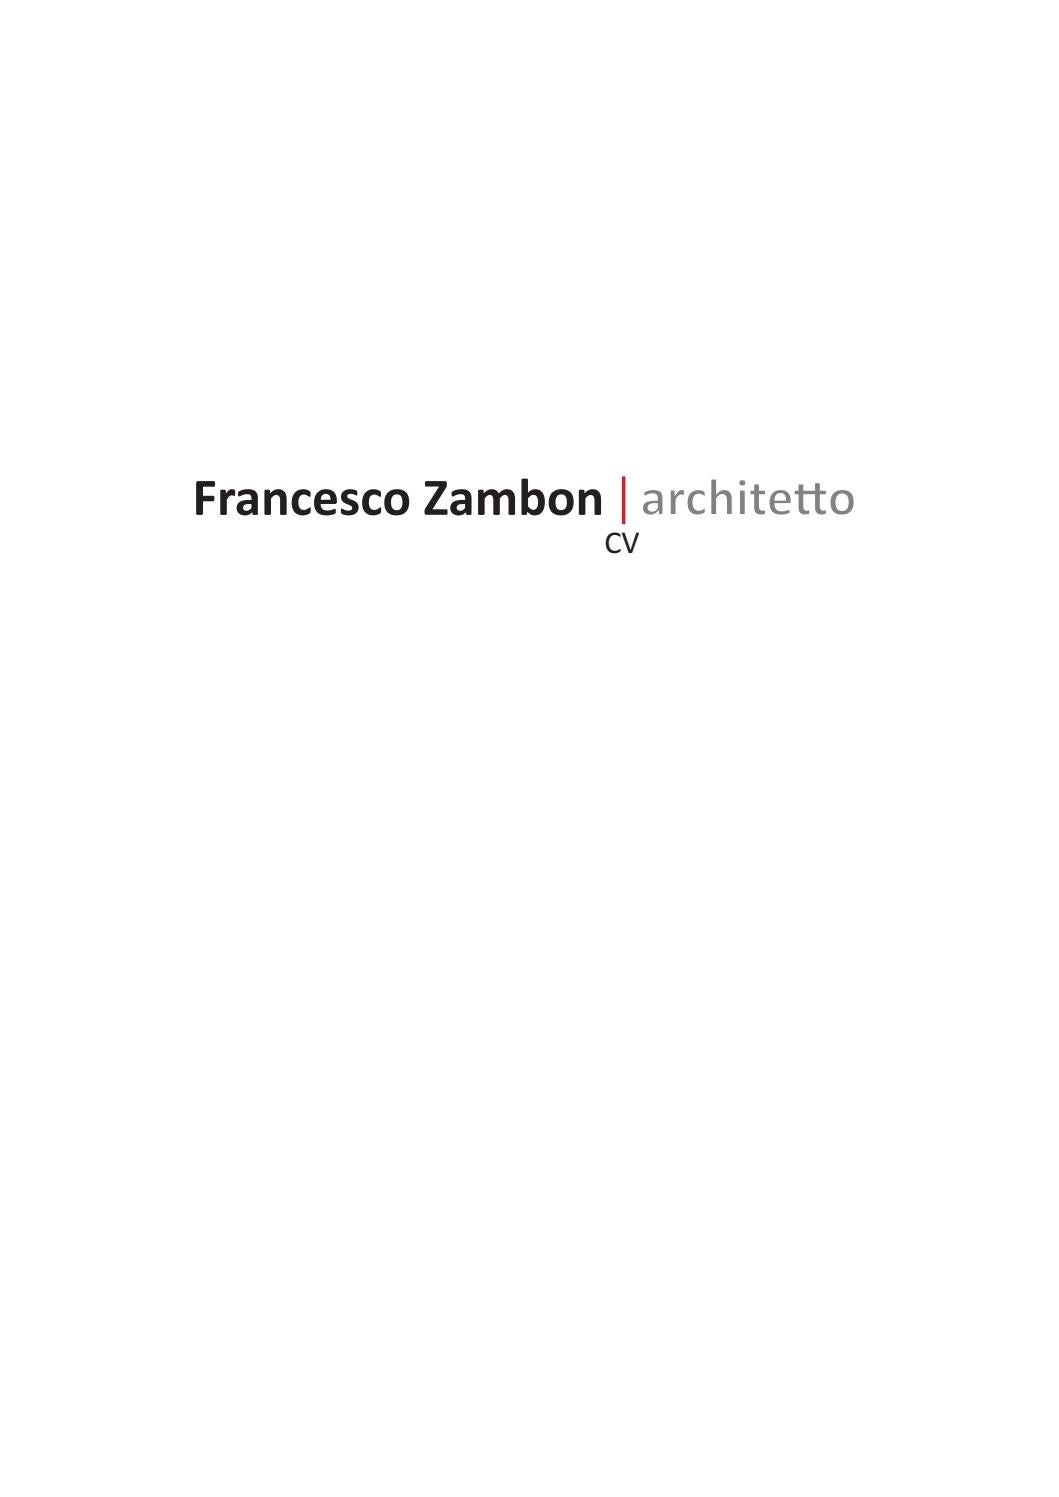 Francesco Zambon architetto - CV (ITA) by Francesco Zambon - issuu